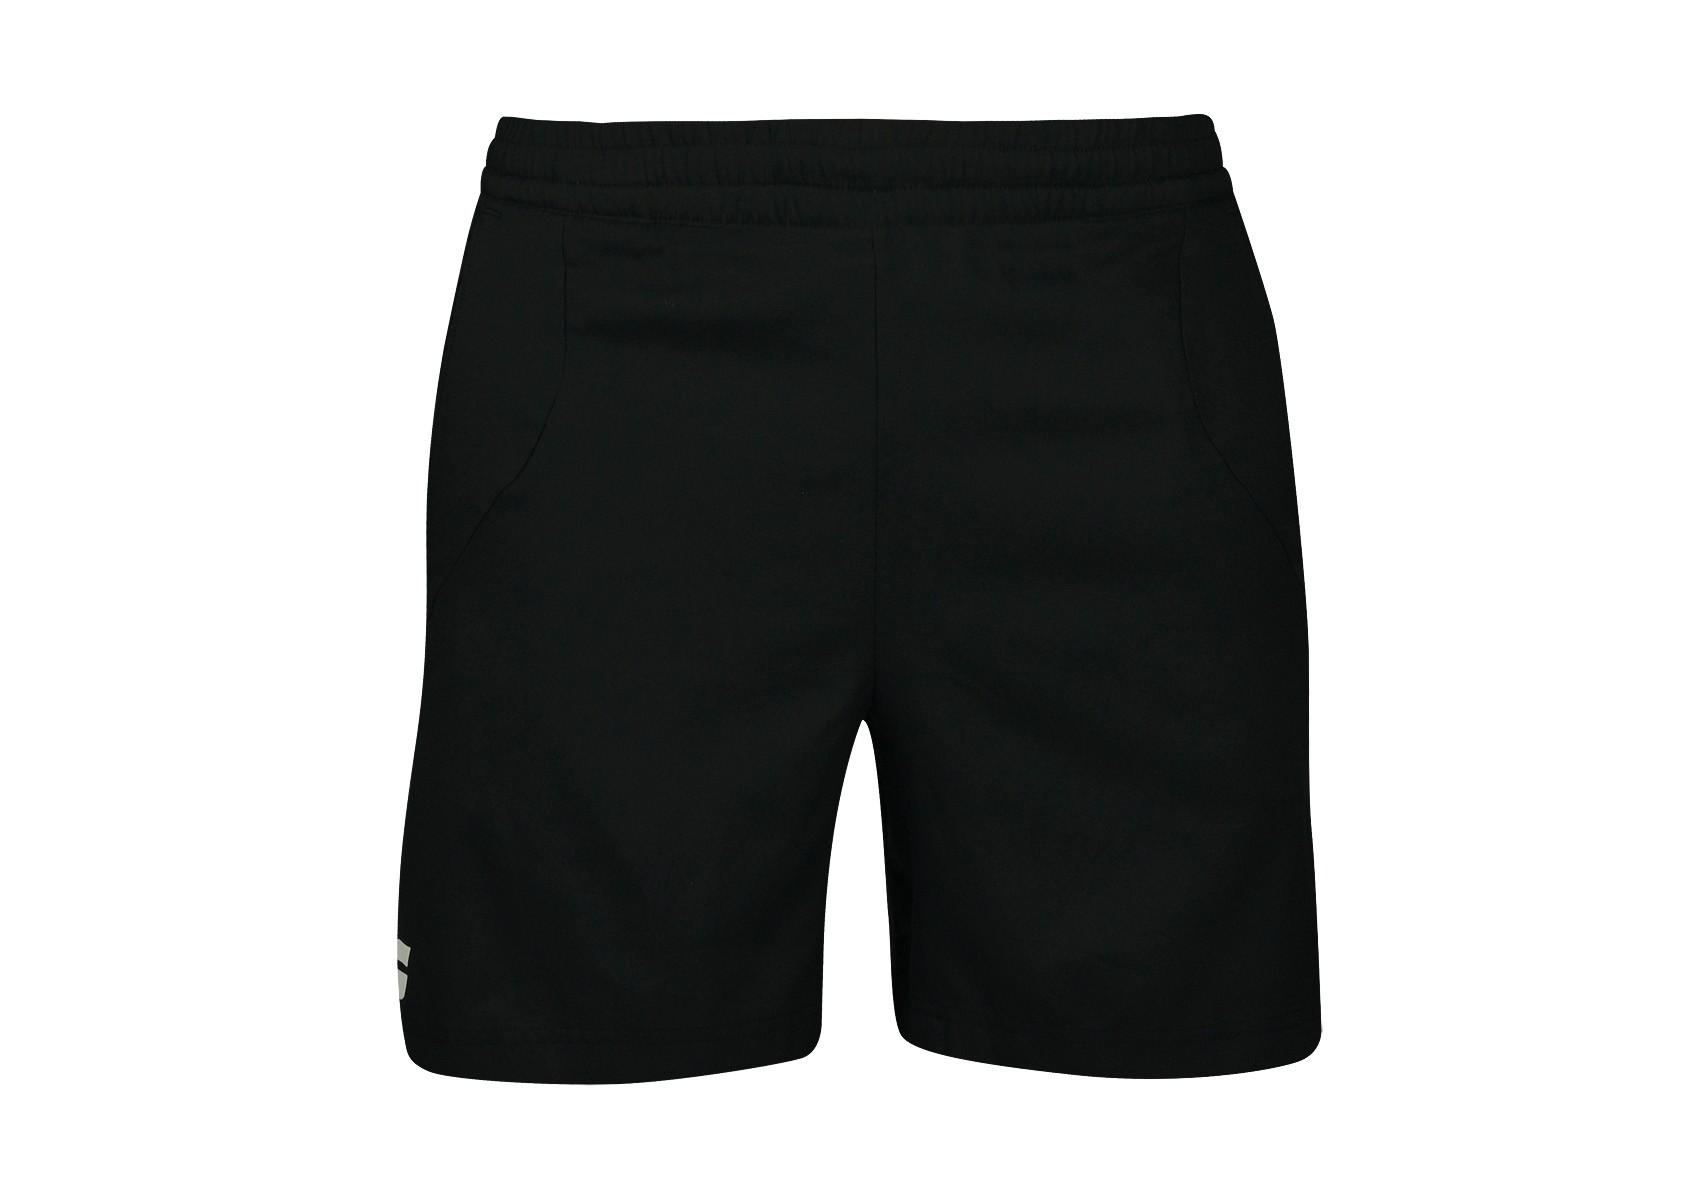 "Spodenki tenisowe Babolat CORE 8"" Black"